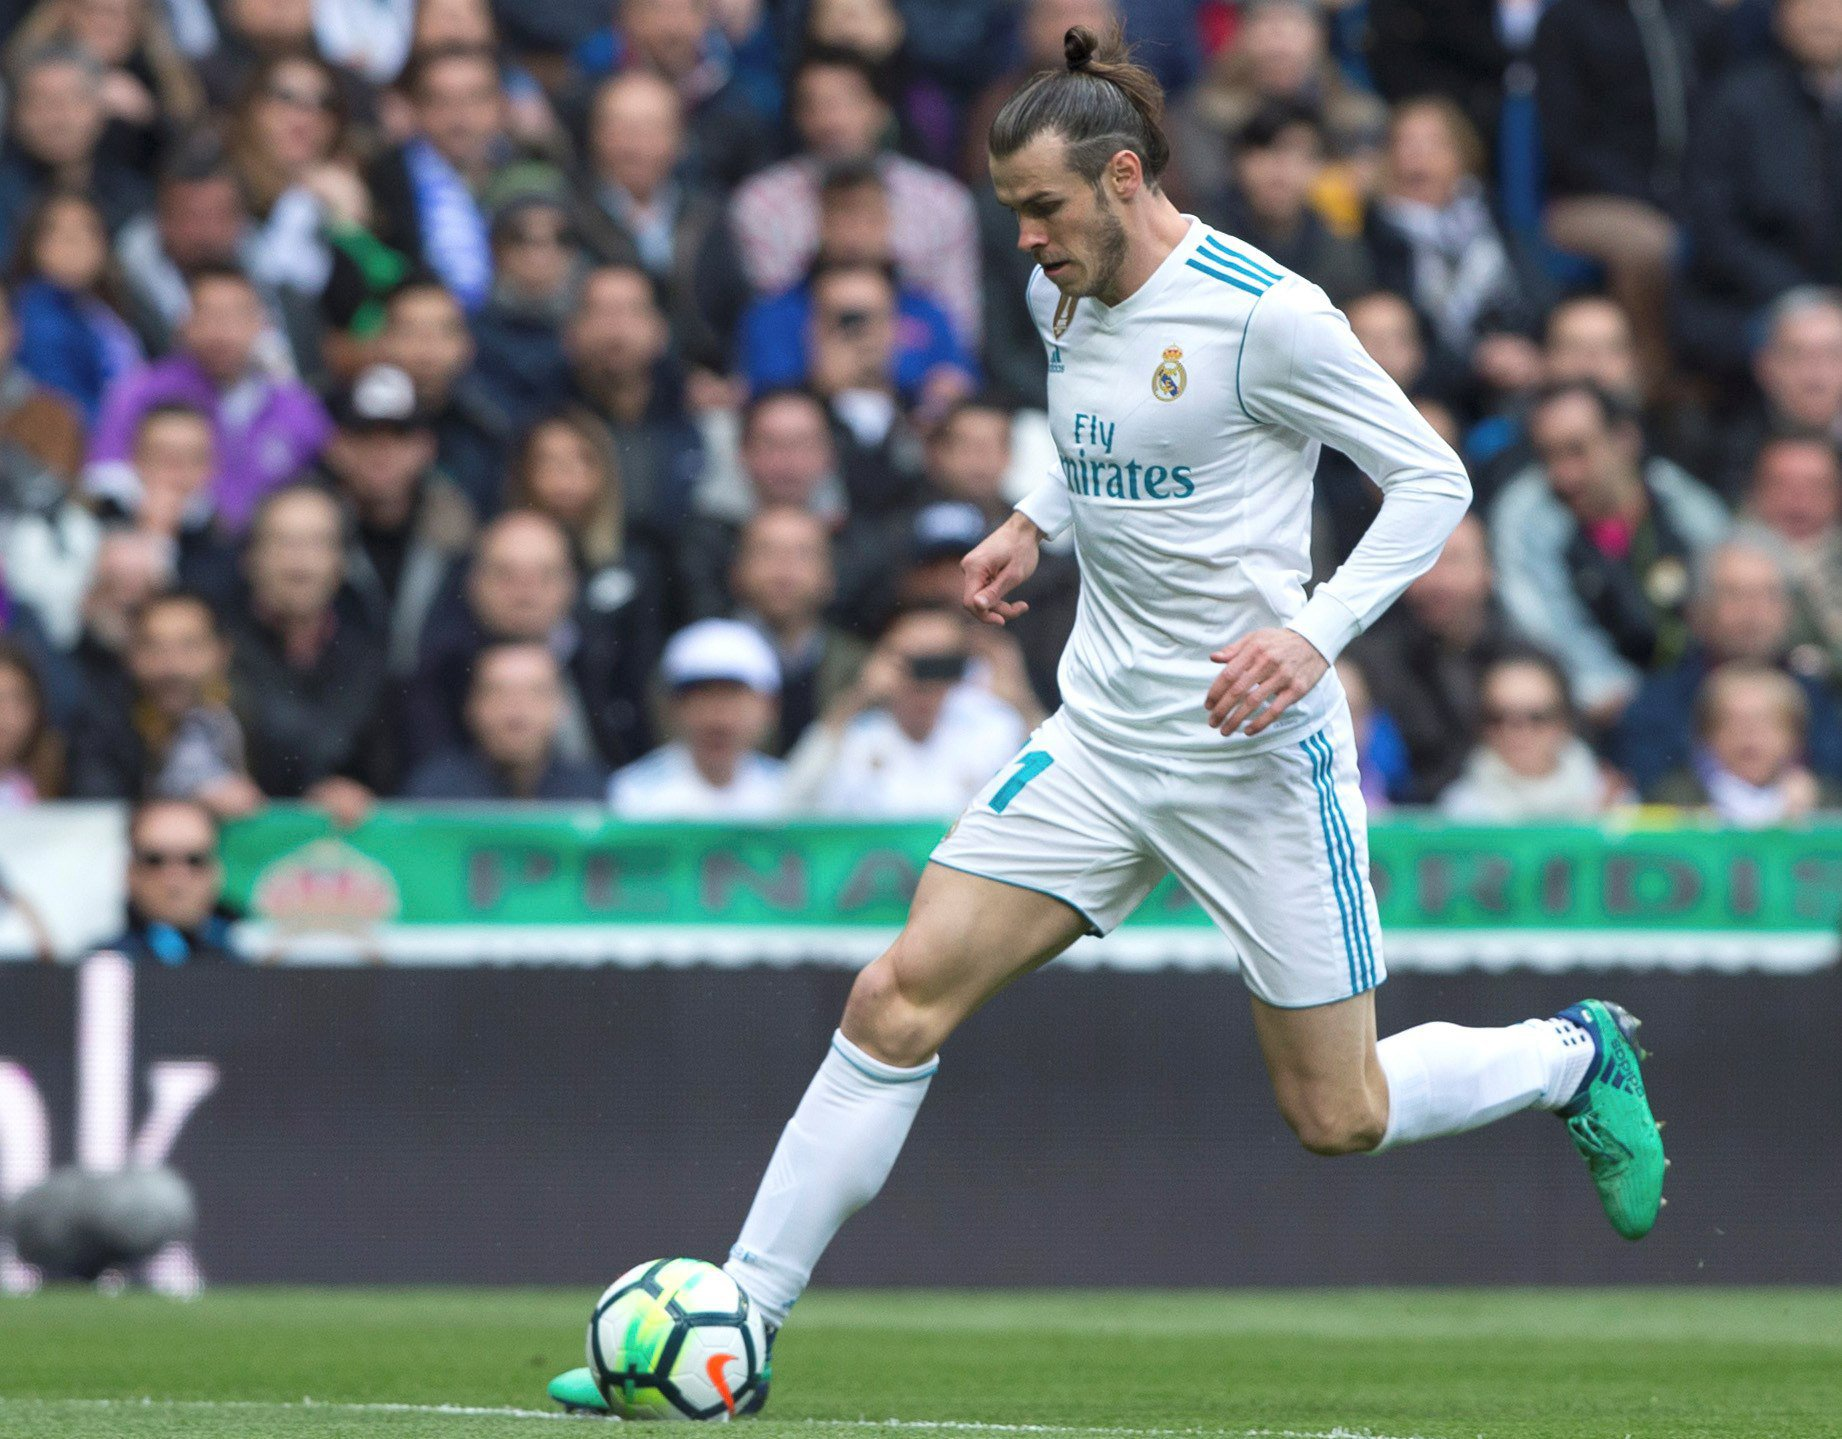 Gareth Bale happy at Real Madrid despite transfer links, insists Zinedine Zidane